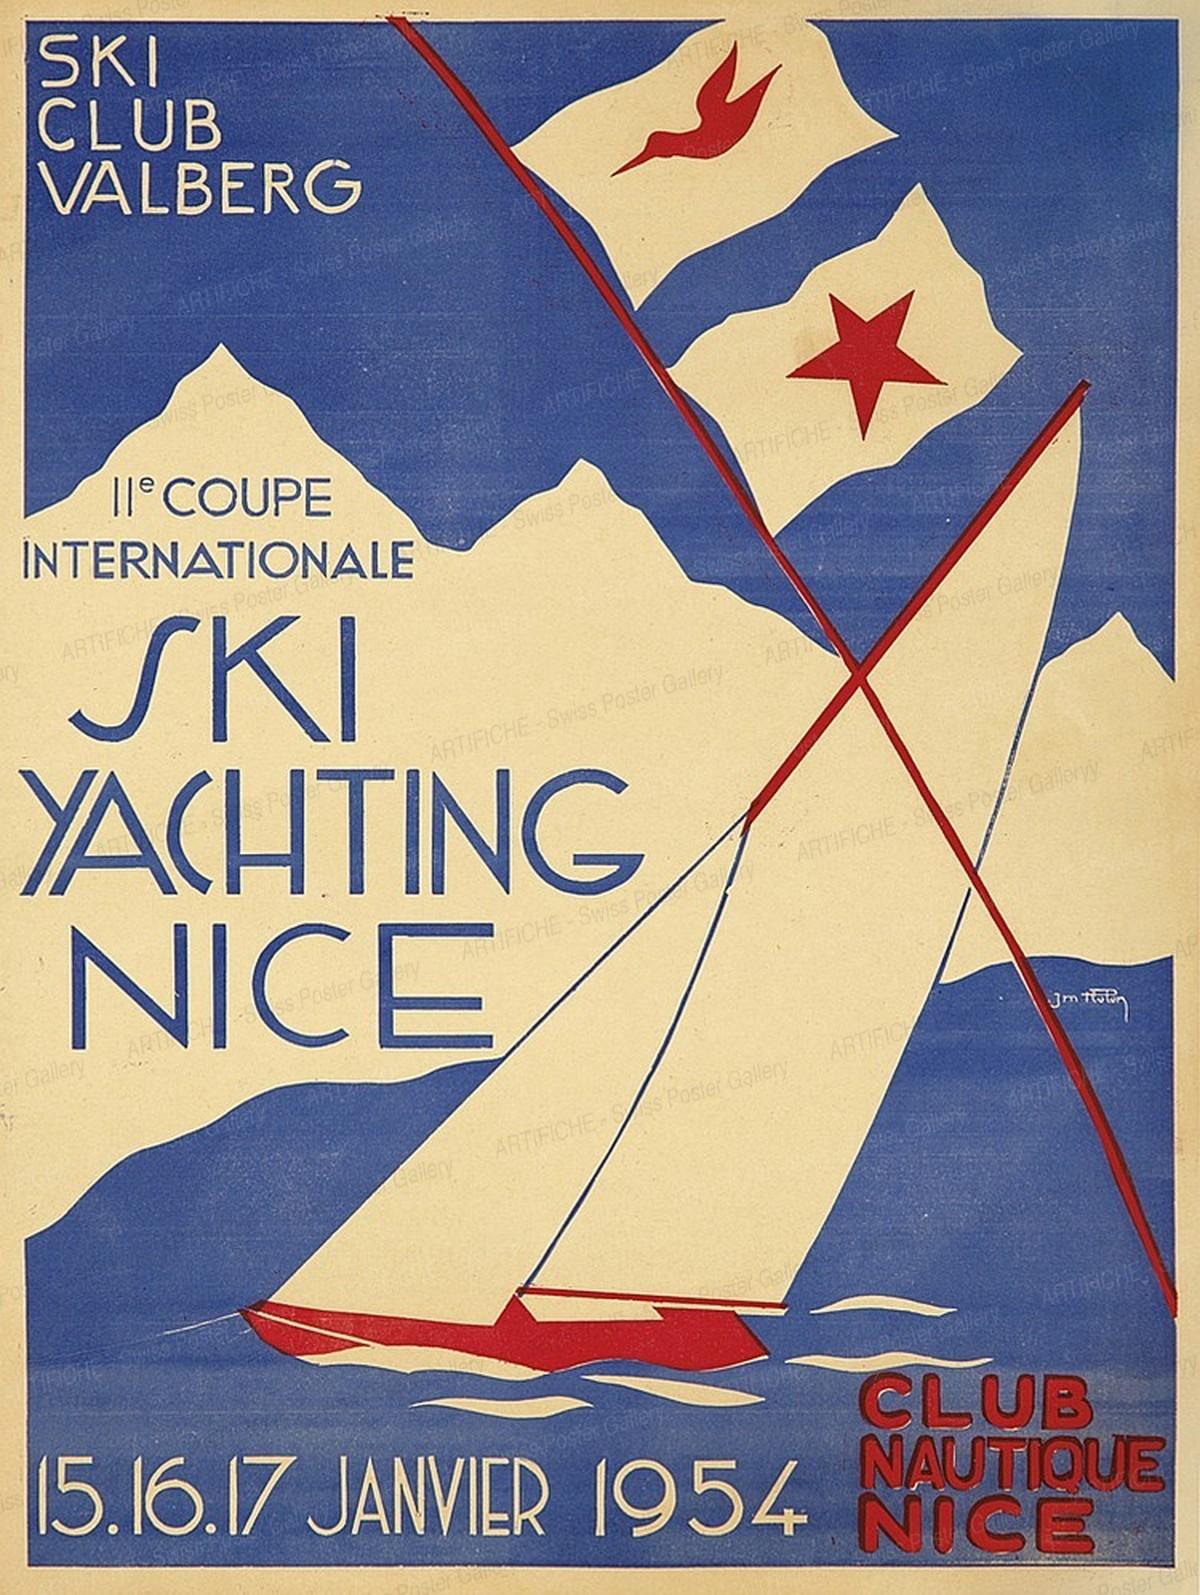 Ski Club Valberg – Ski Yachting Nice, J.M. Hupon